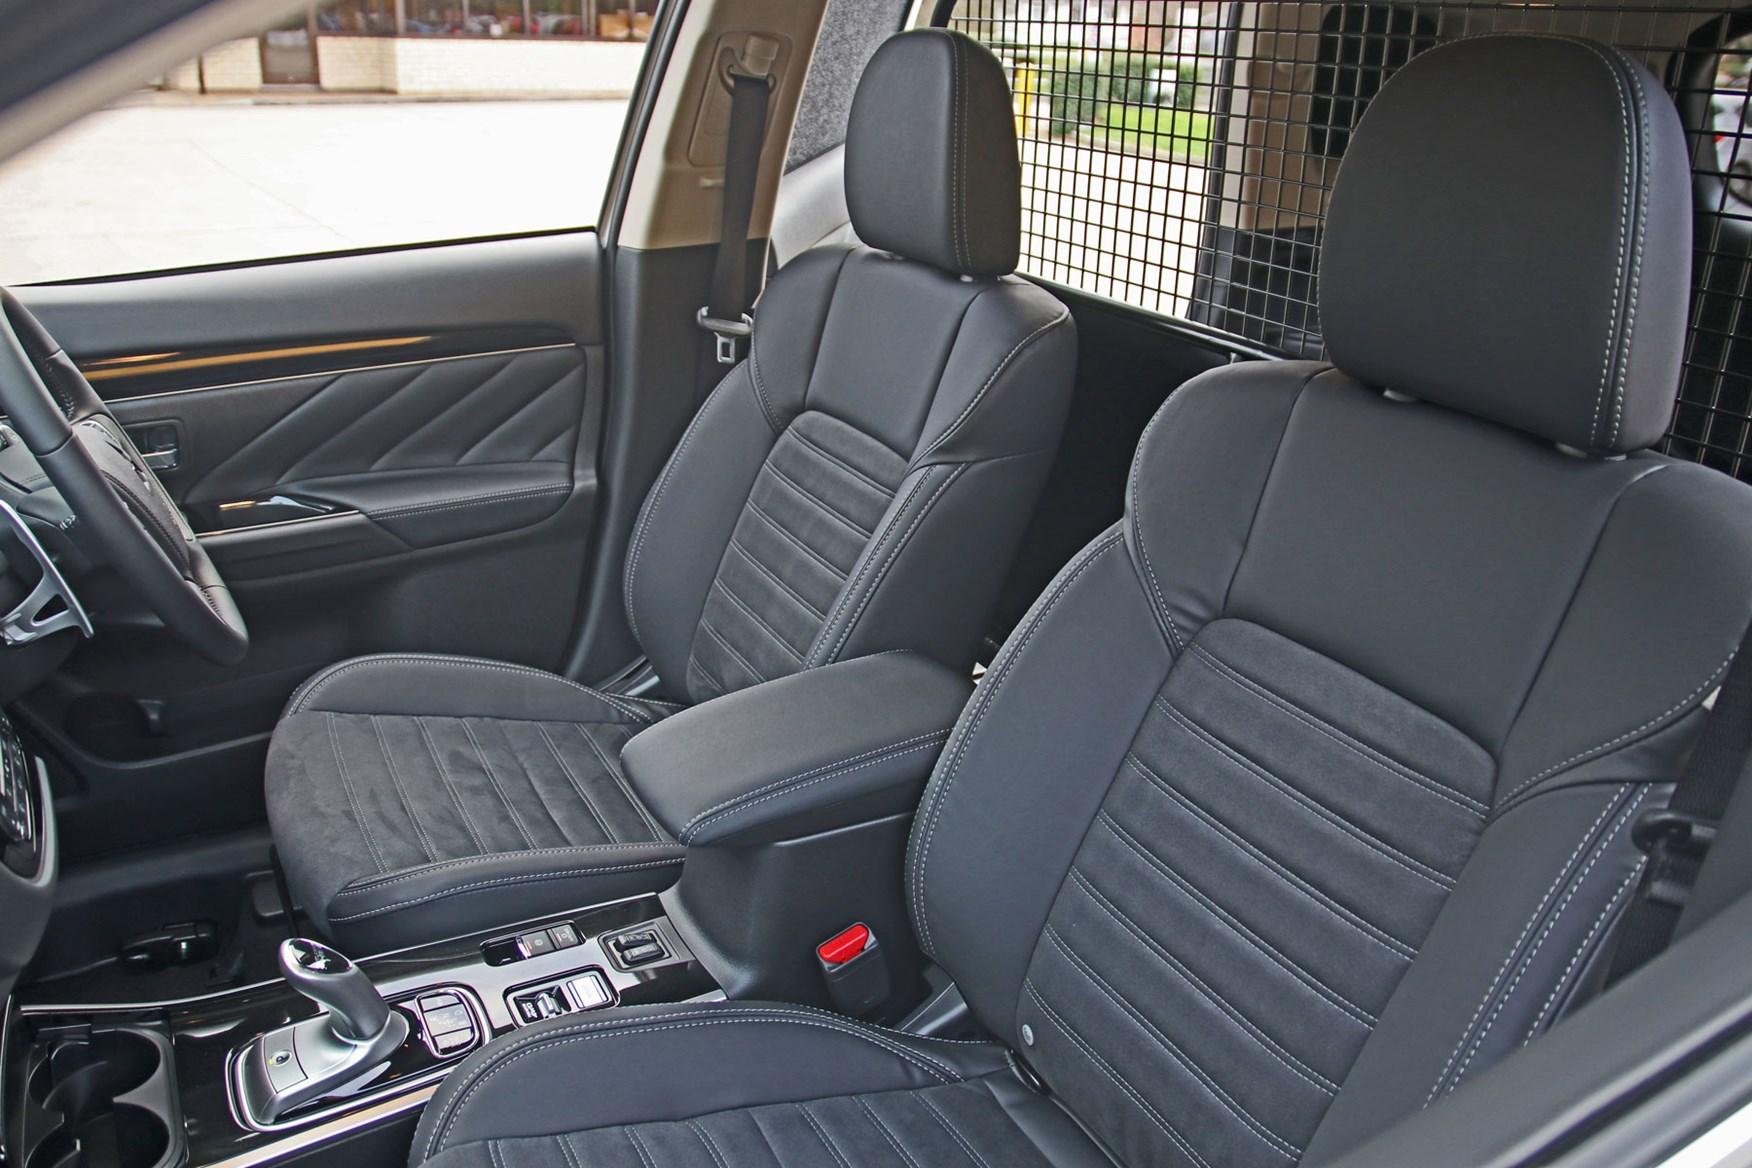 Mitsubishi Outlander Commercial 4x4 van review | Parkers